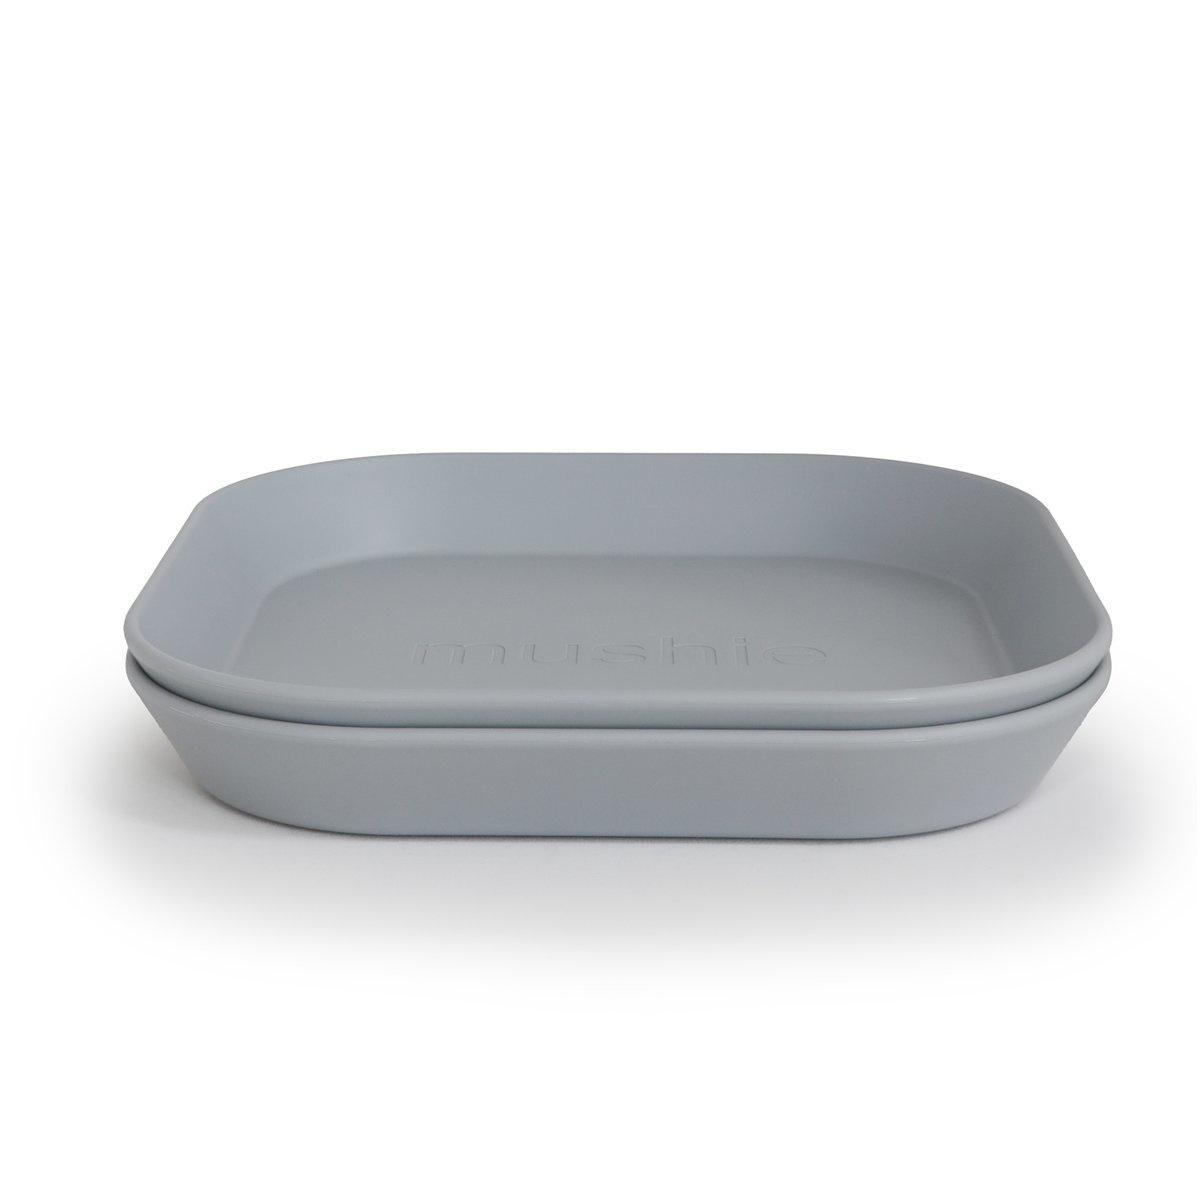 Mushie Plates square set of 2 | Cloud